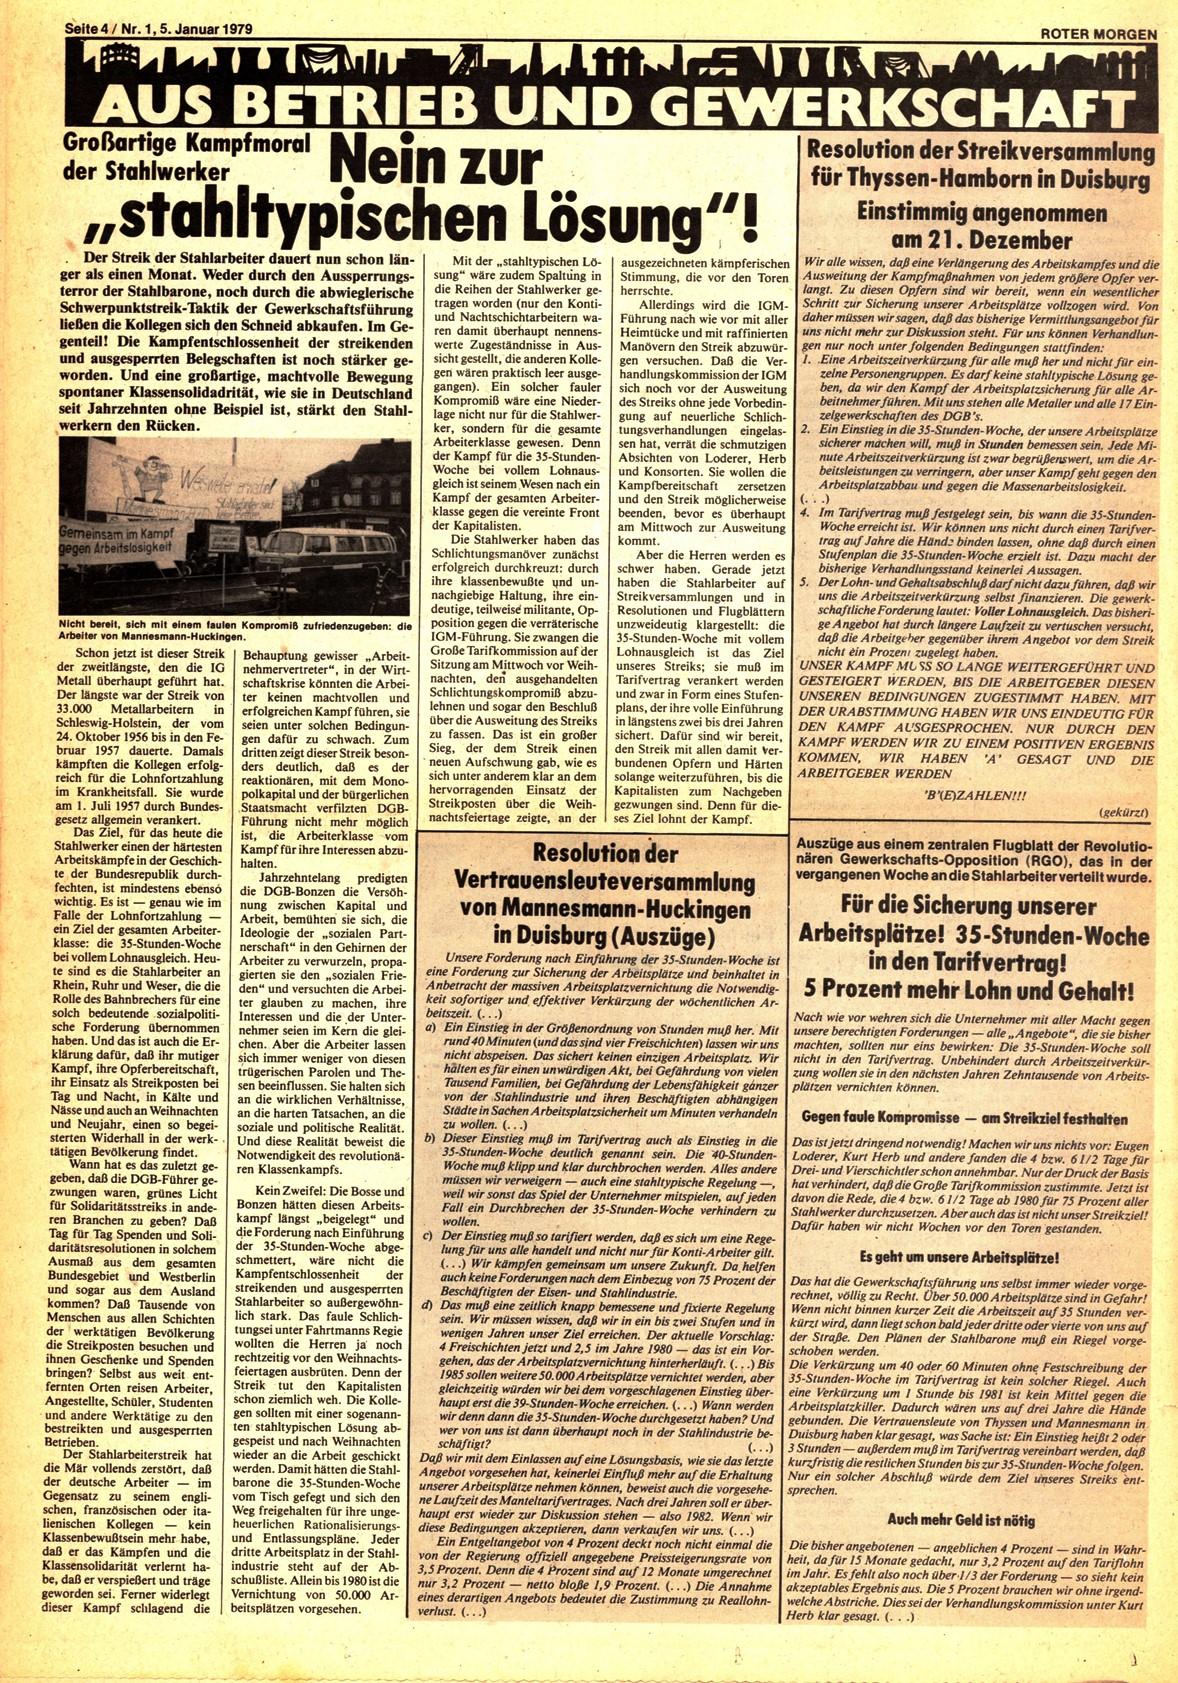 Roter Morgen, 13. Jg., 5. Januar 1979, Nr. 1, Seite 4